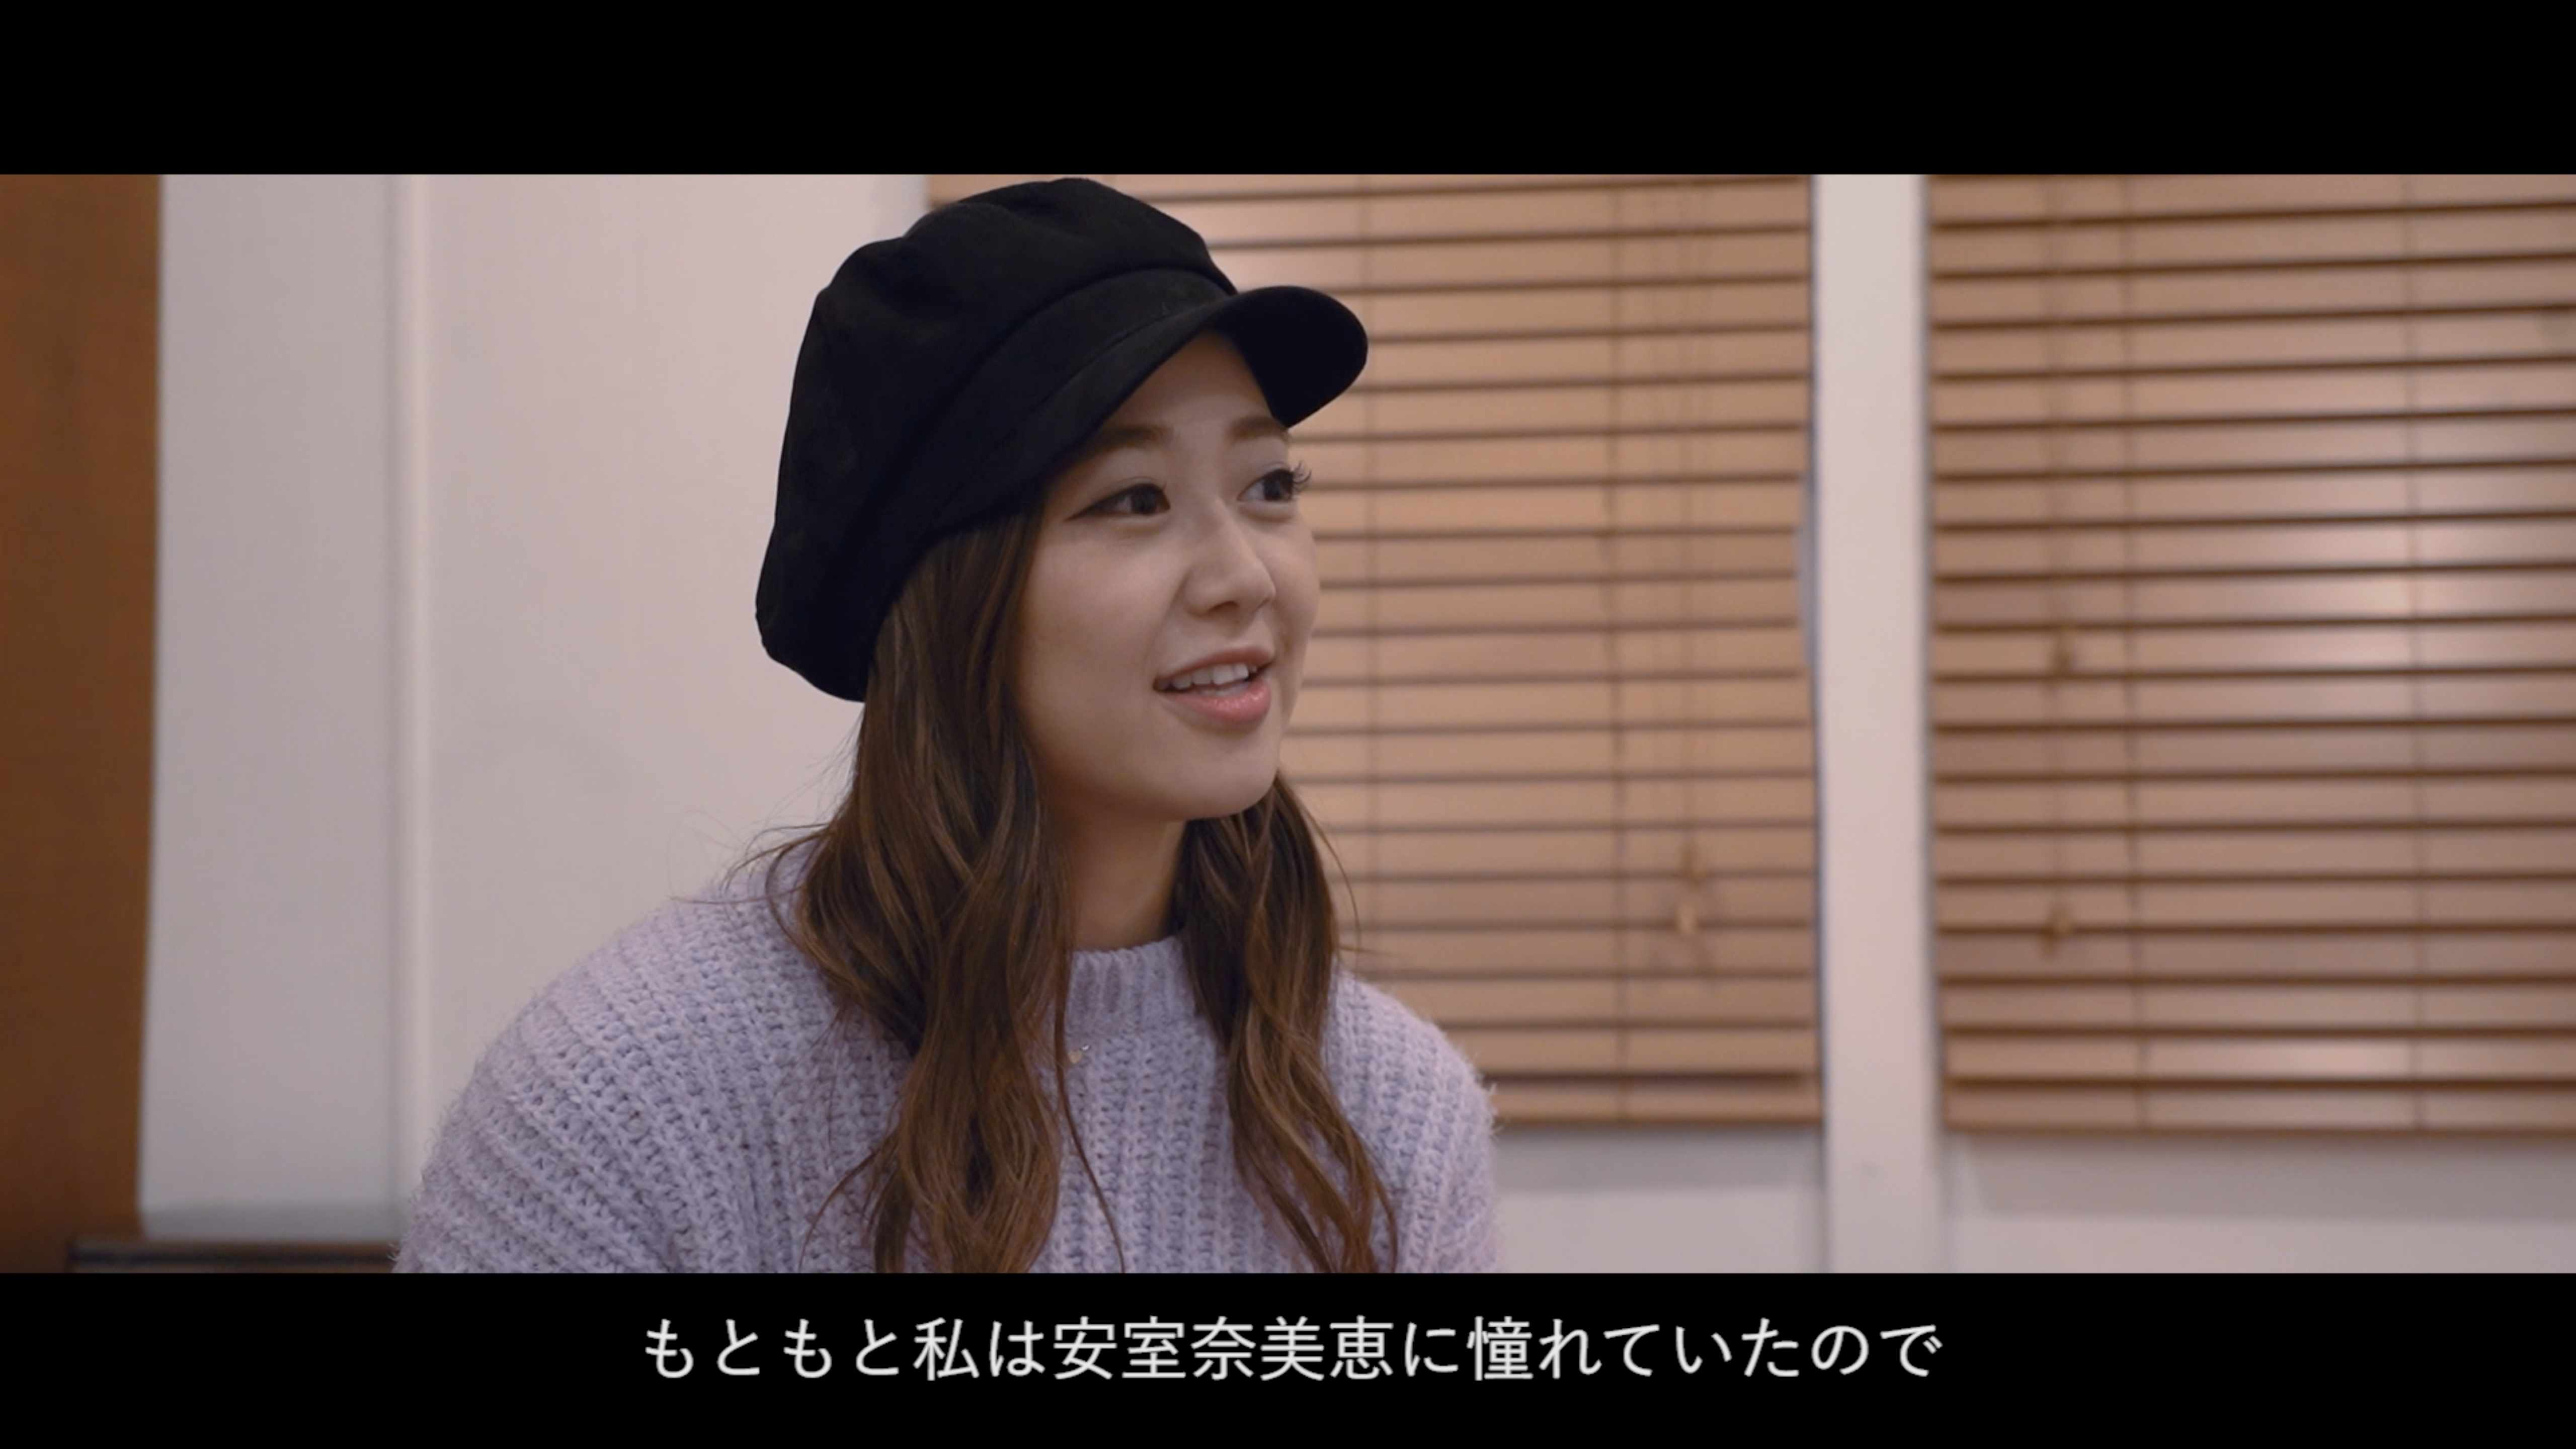 hy4_4yh(ハイパーヨーヨ)ドキュメンタリー第7話 画像02